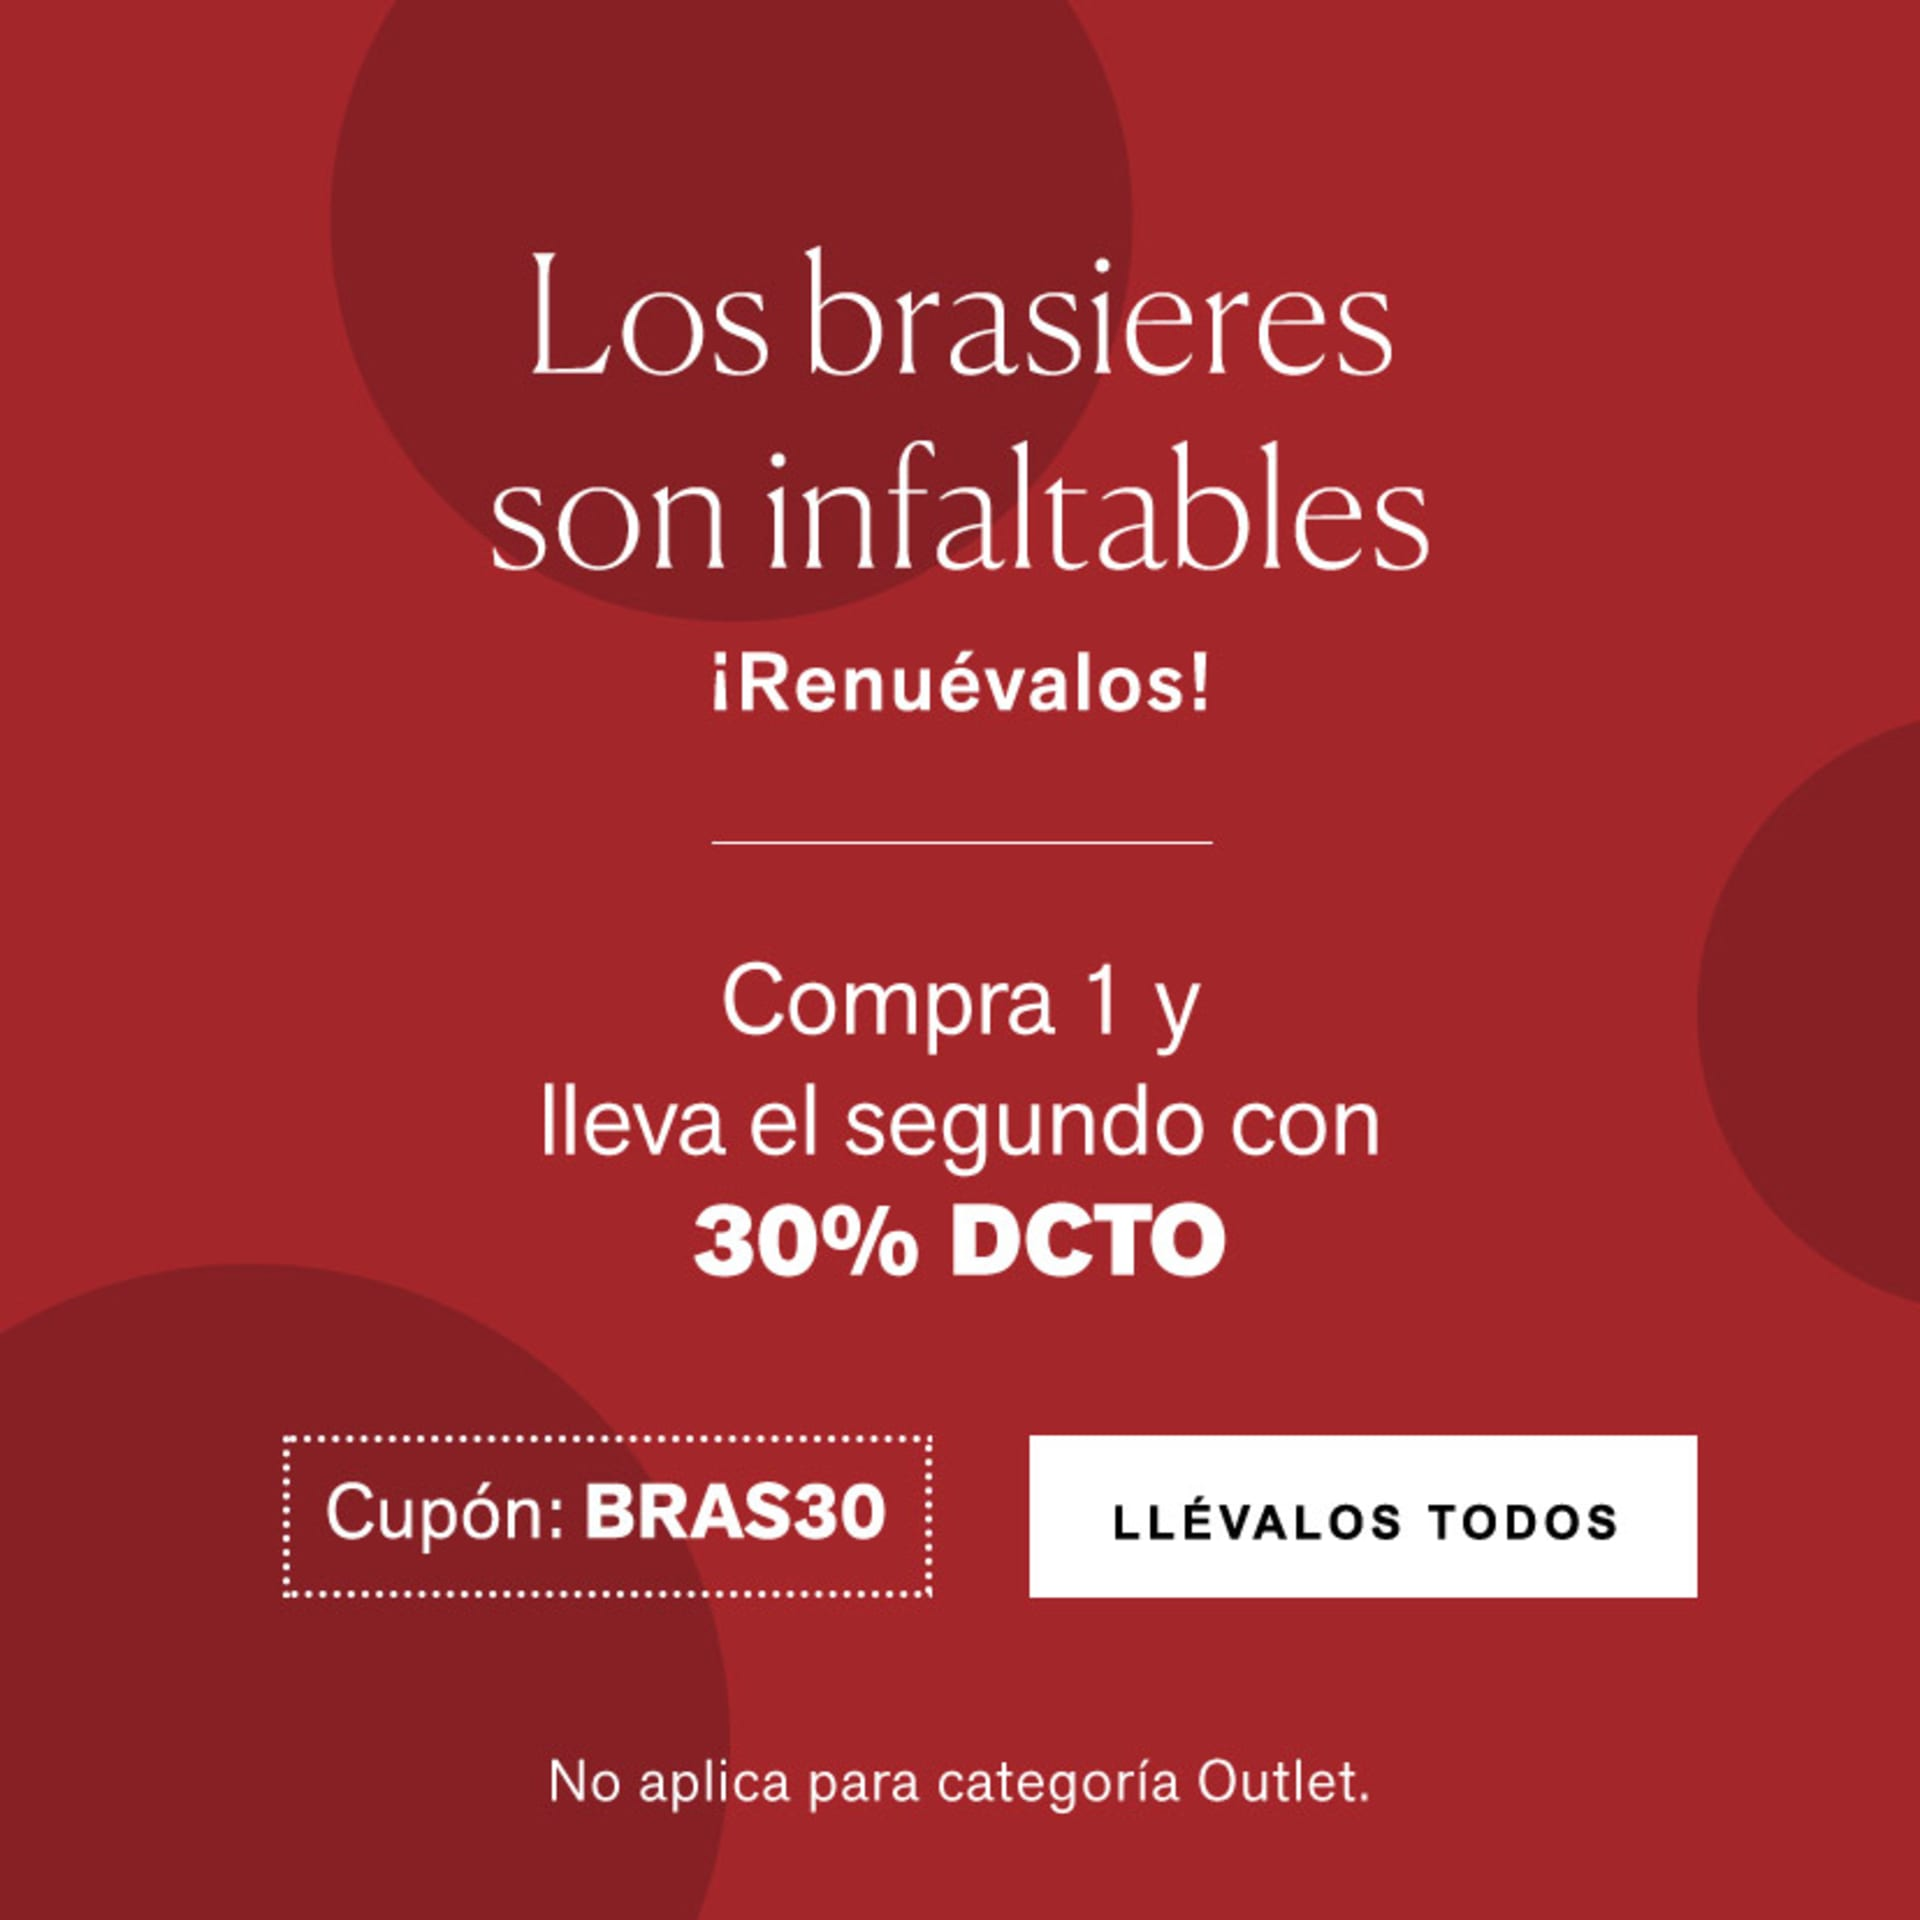 Oferta Brasieres Leonisa